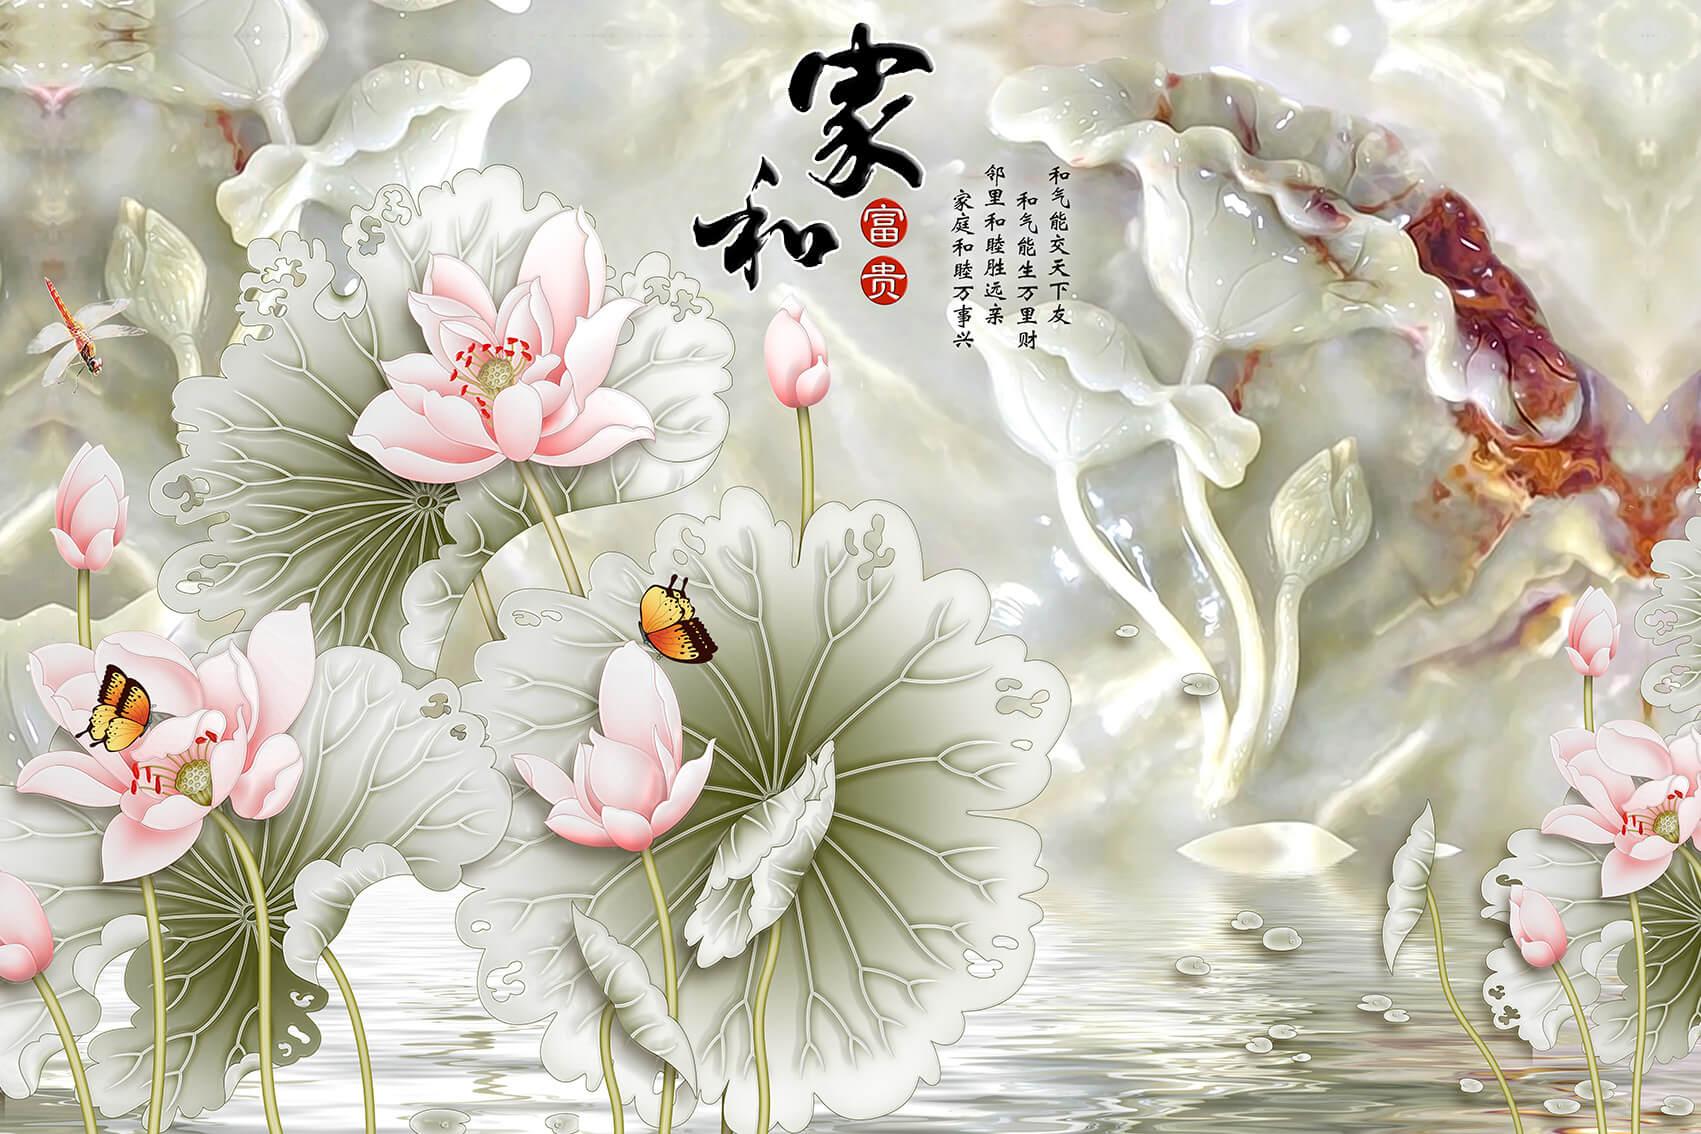 tranh-dan-tuong-gia-ngoc-101